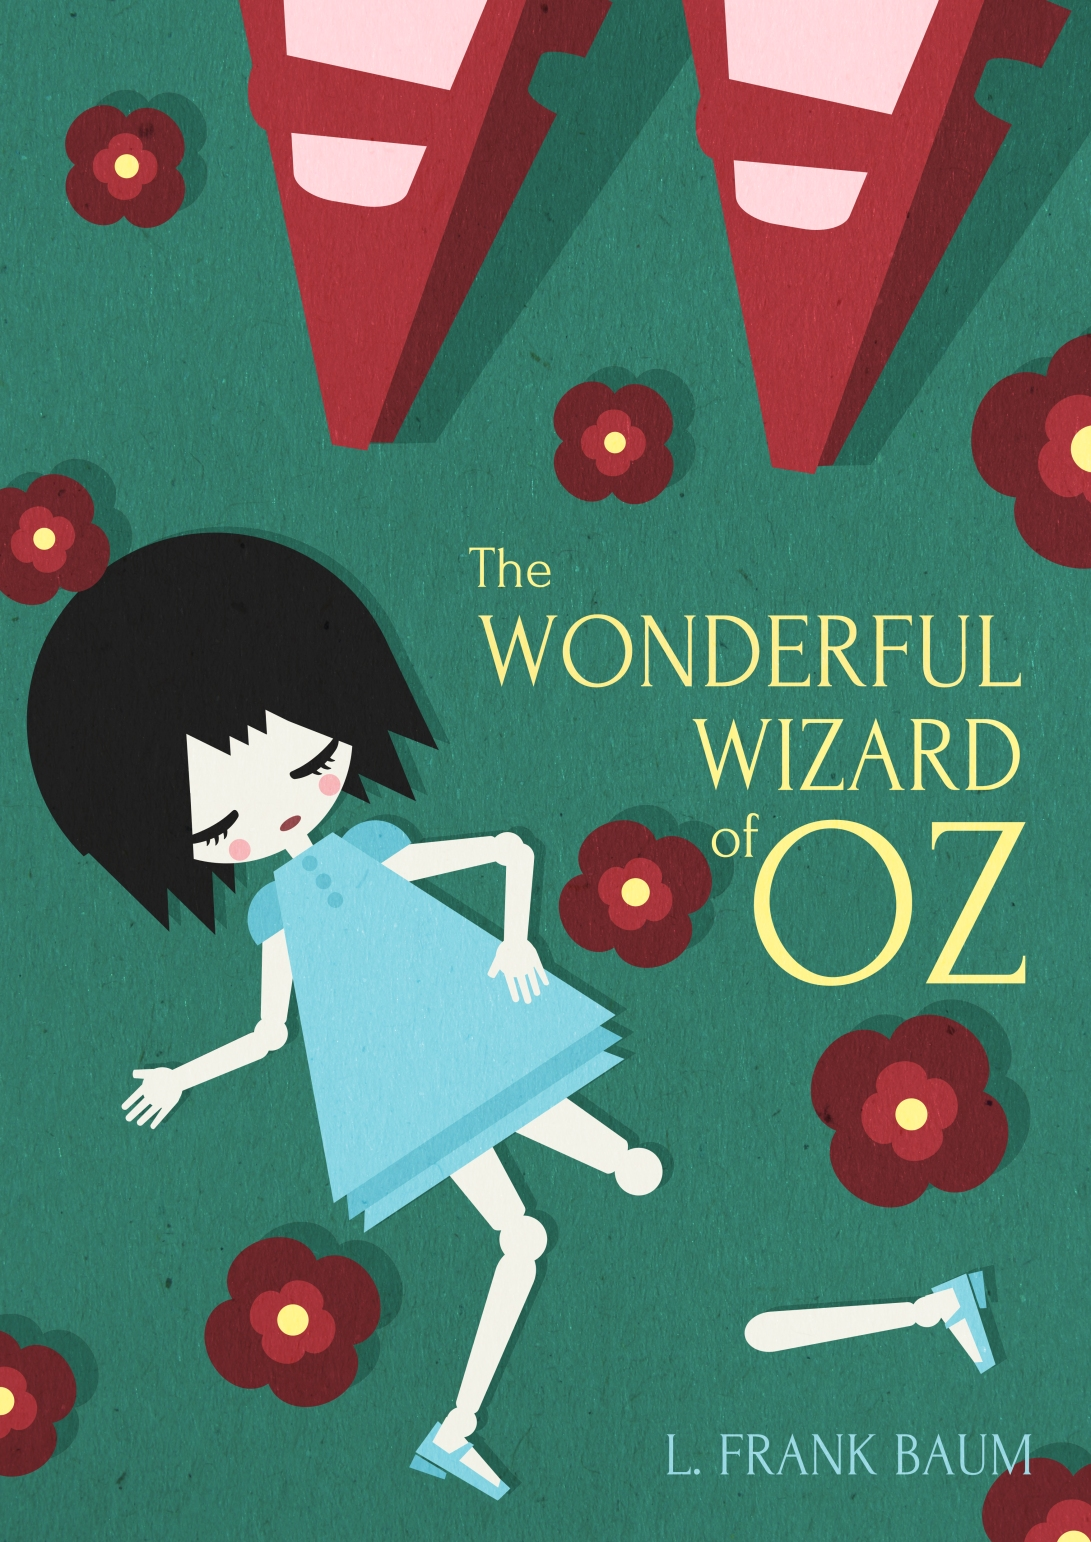 wonderful wizard oz lyman frank baum book cover vector art illustration graphics design digital minimal design graphic design illustrator grafica denis bettio